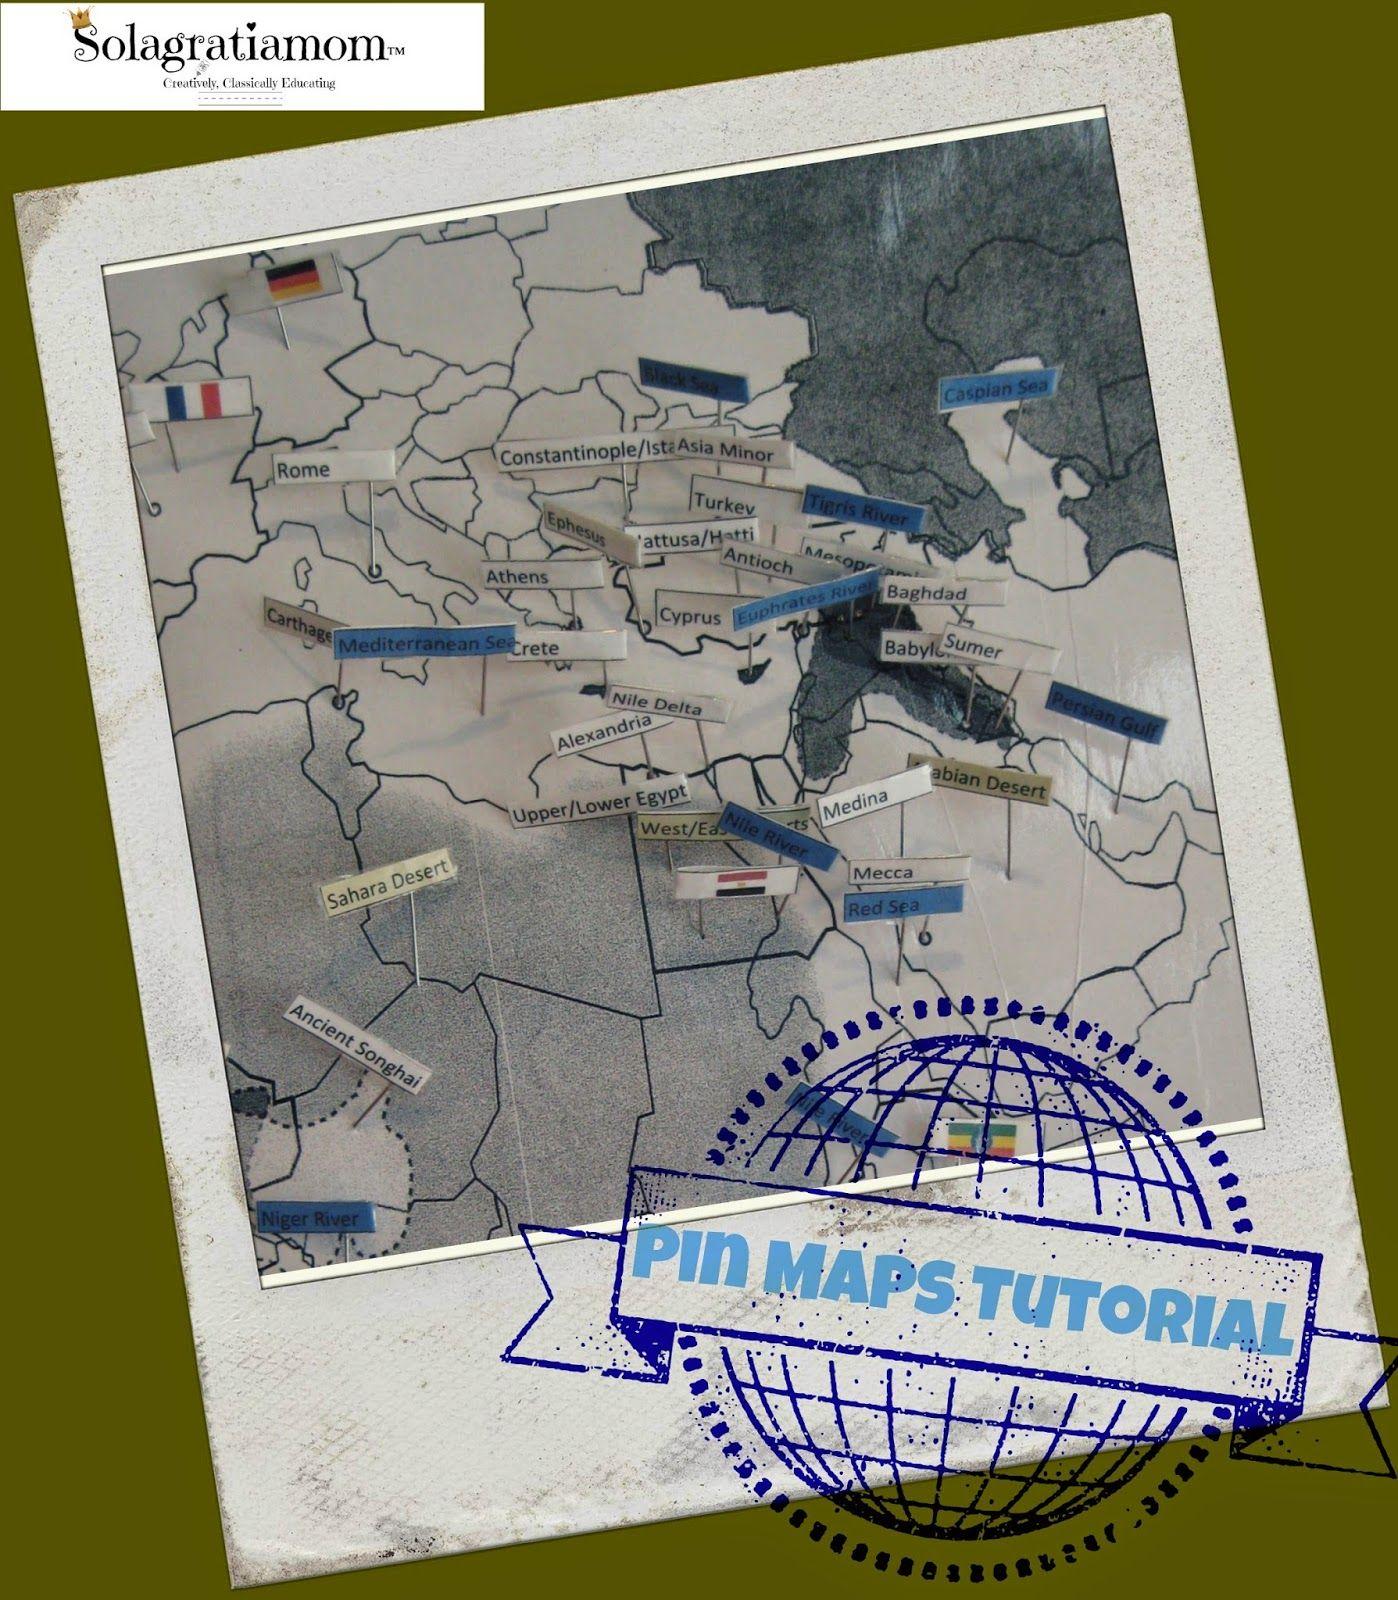 Pin Maps Tutorial